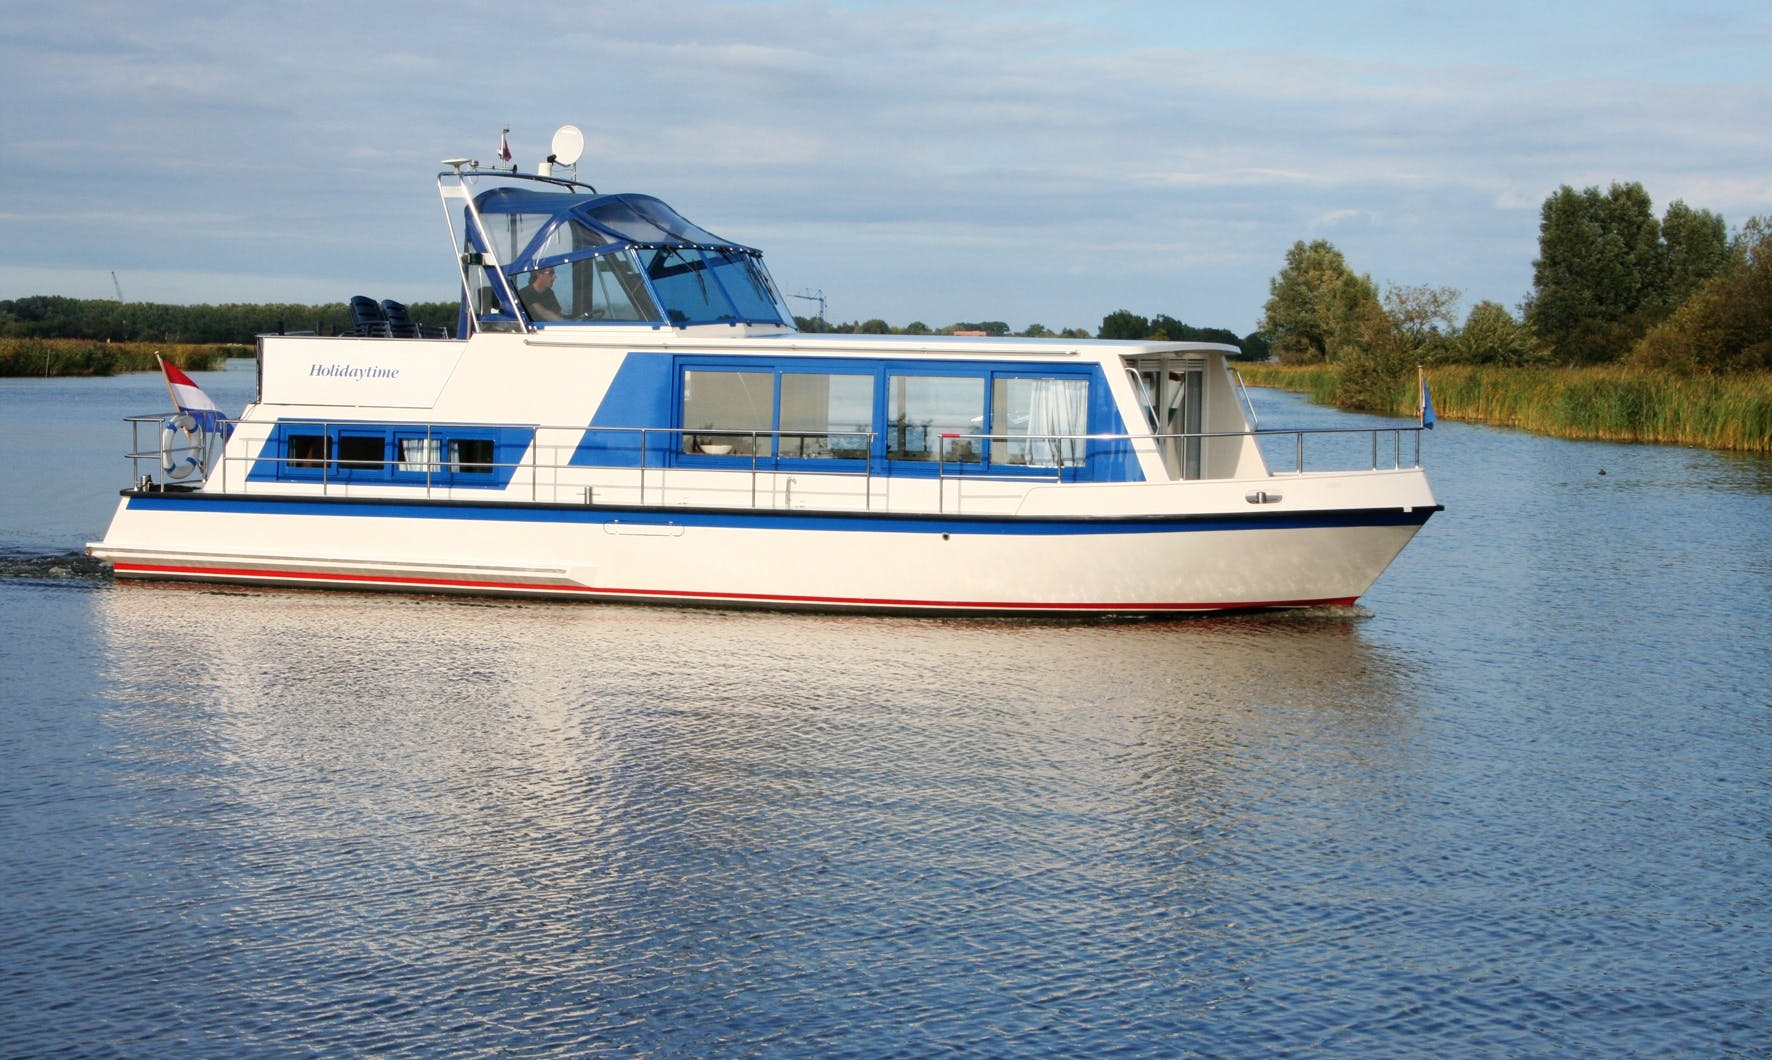 39' Safari Houseboat 1200 Houseboat Rental in Drachten - Friesland, Netherlands